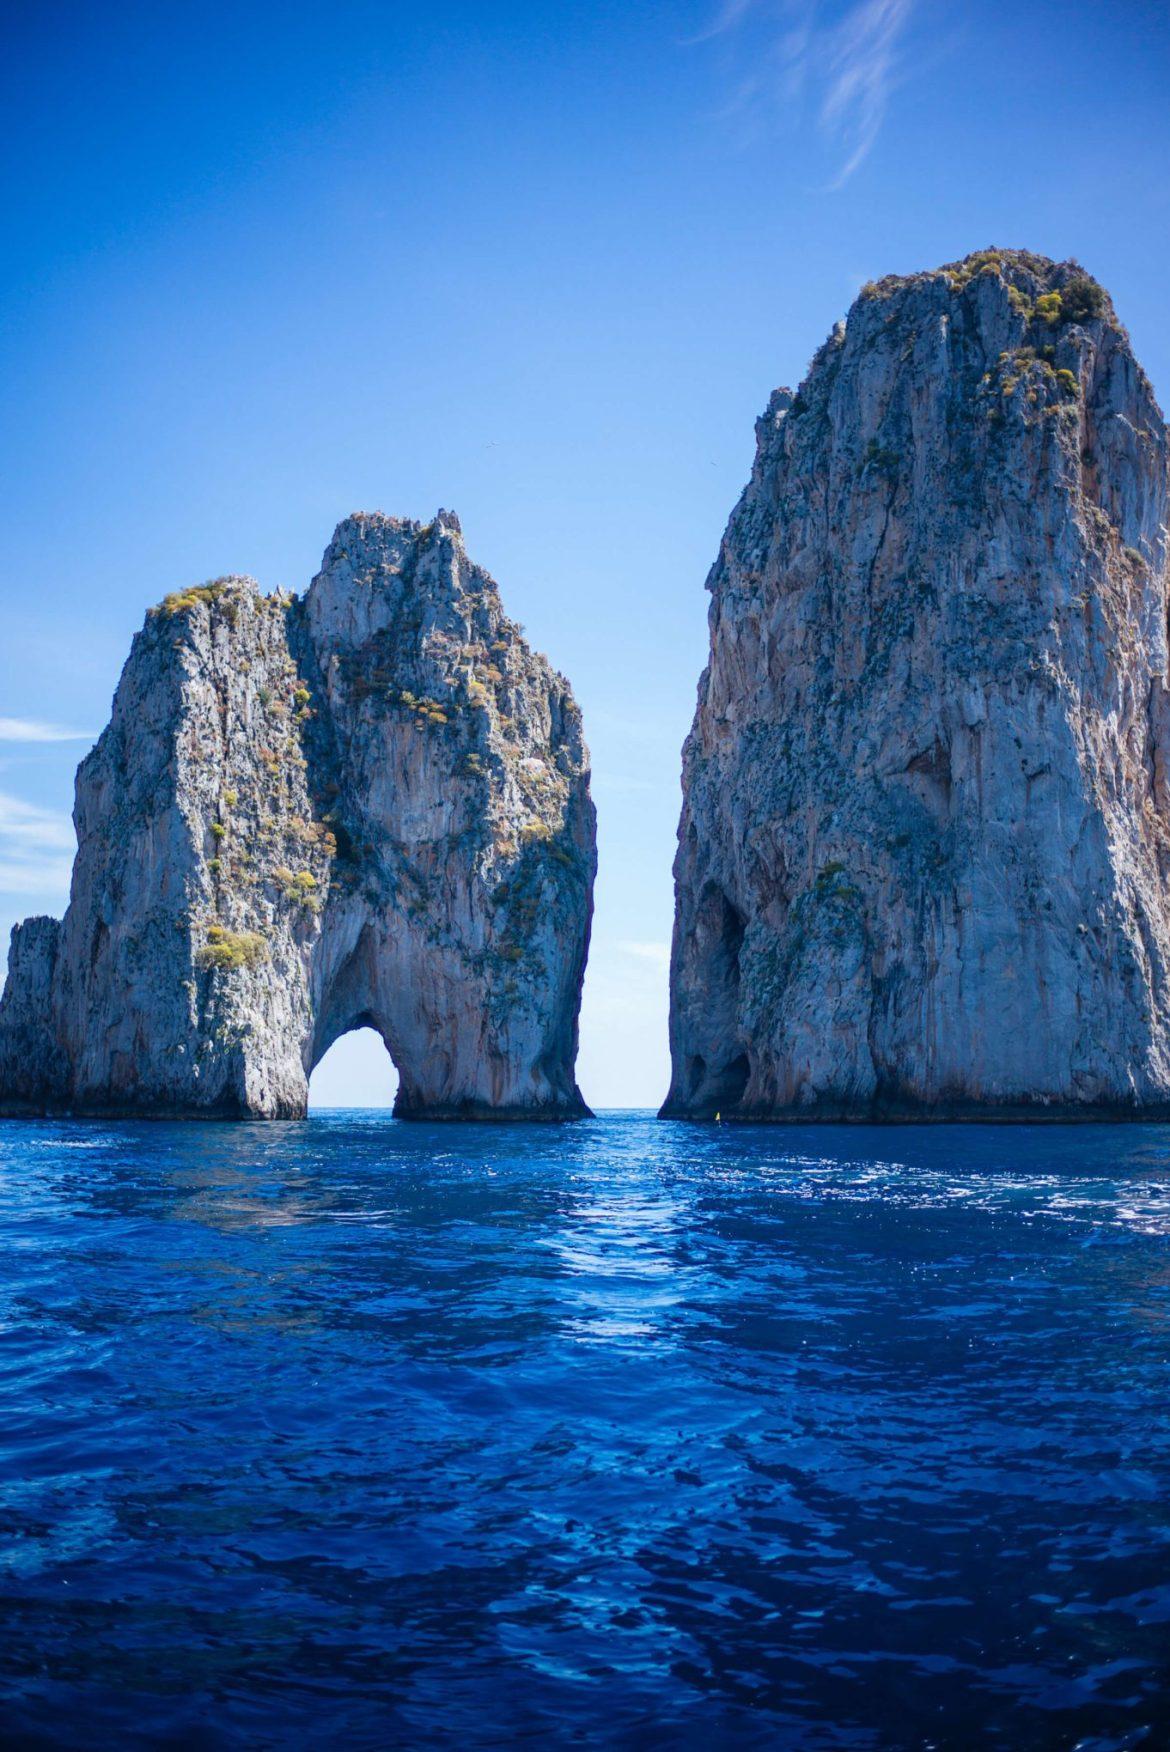 Faraglioni of Capri Italy is directly across from La Fontinella, The Taste Edit